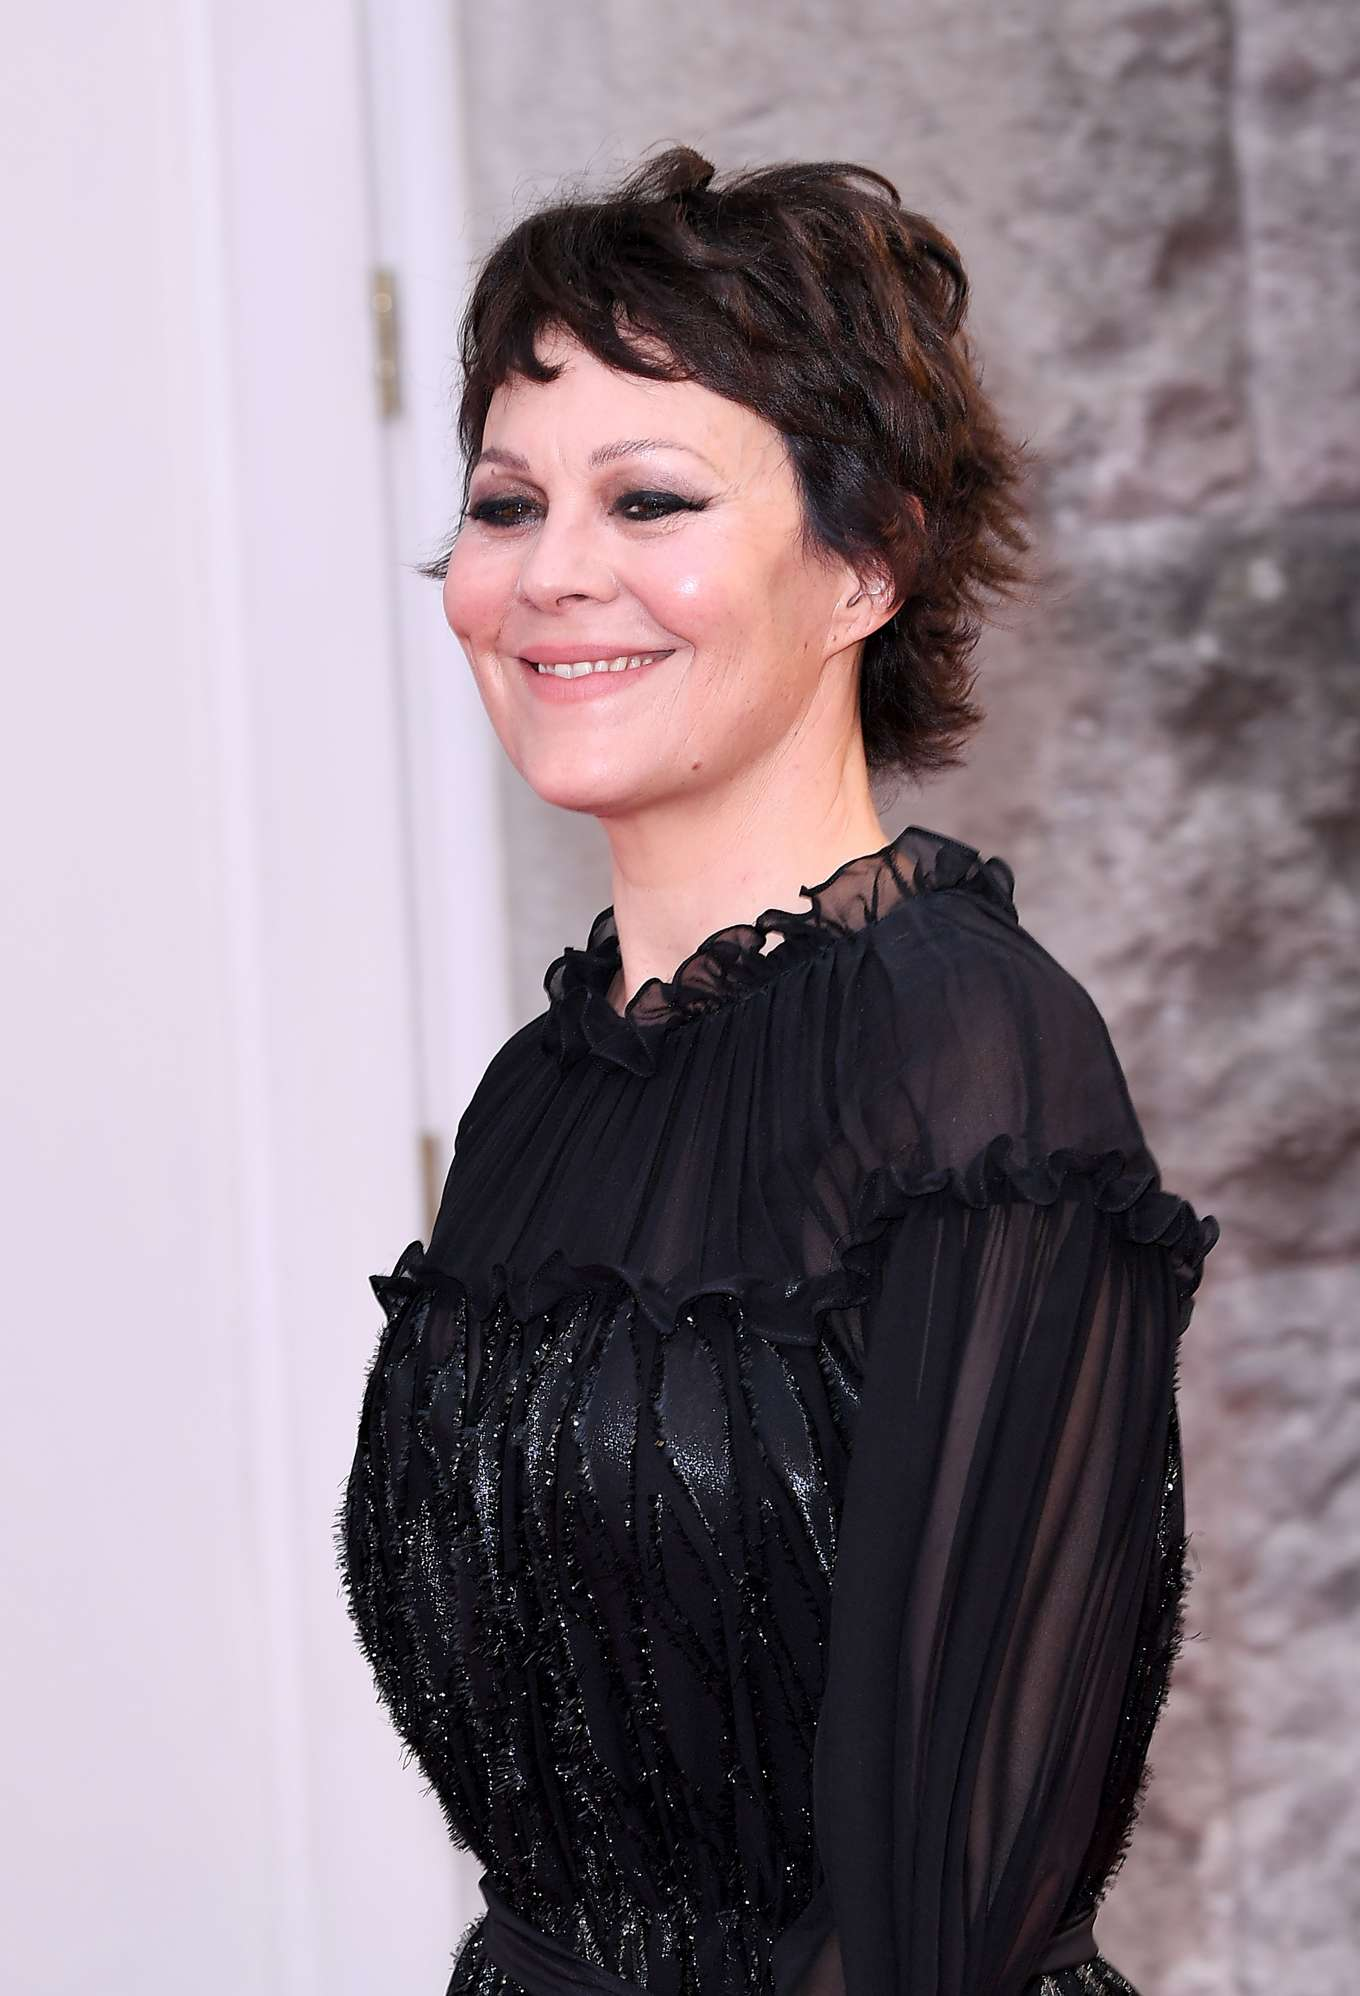 Helen Mccrory Leaving helen mccrory - peaky blinders tv show premiere-01 | gotceleb